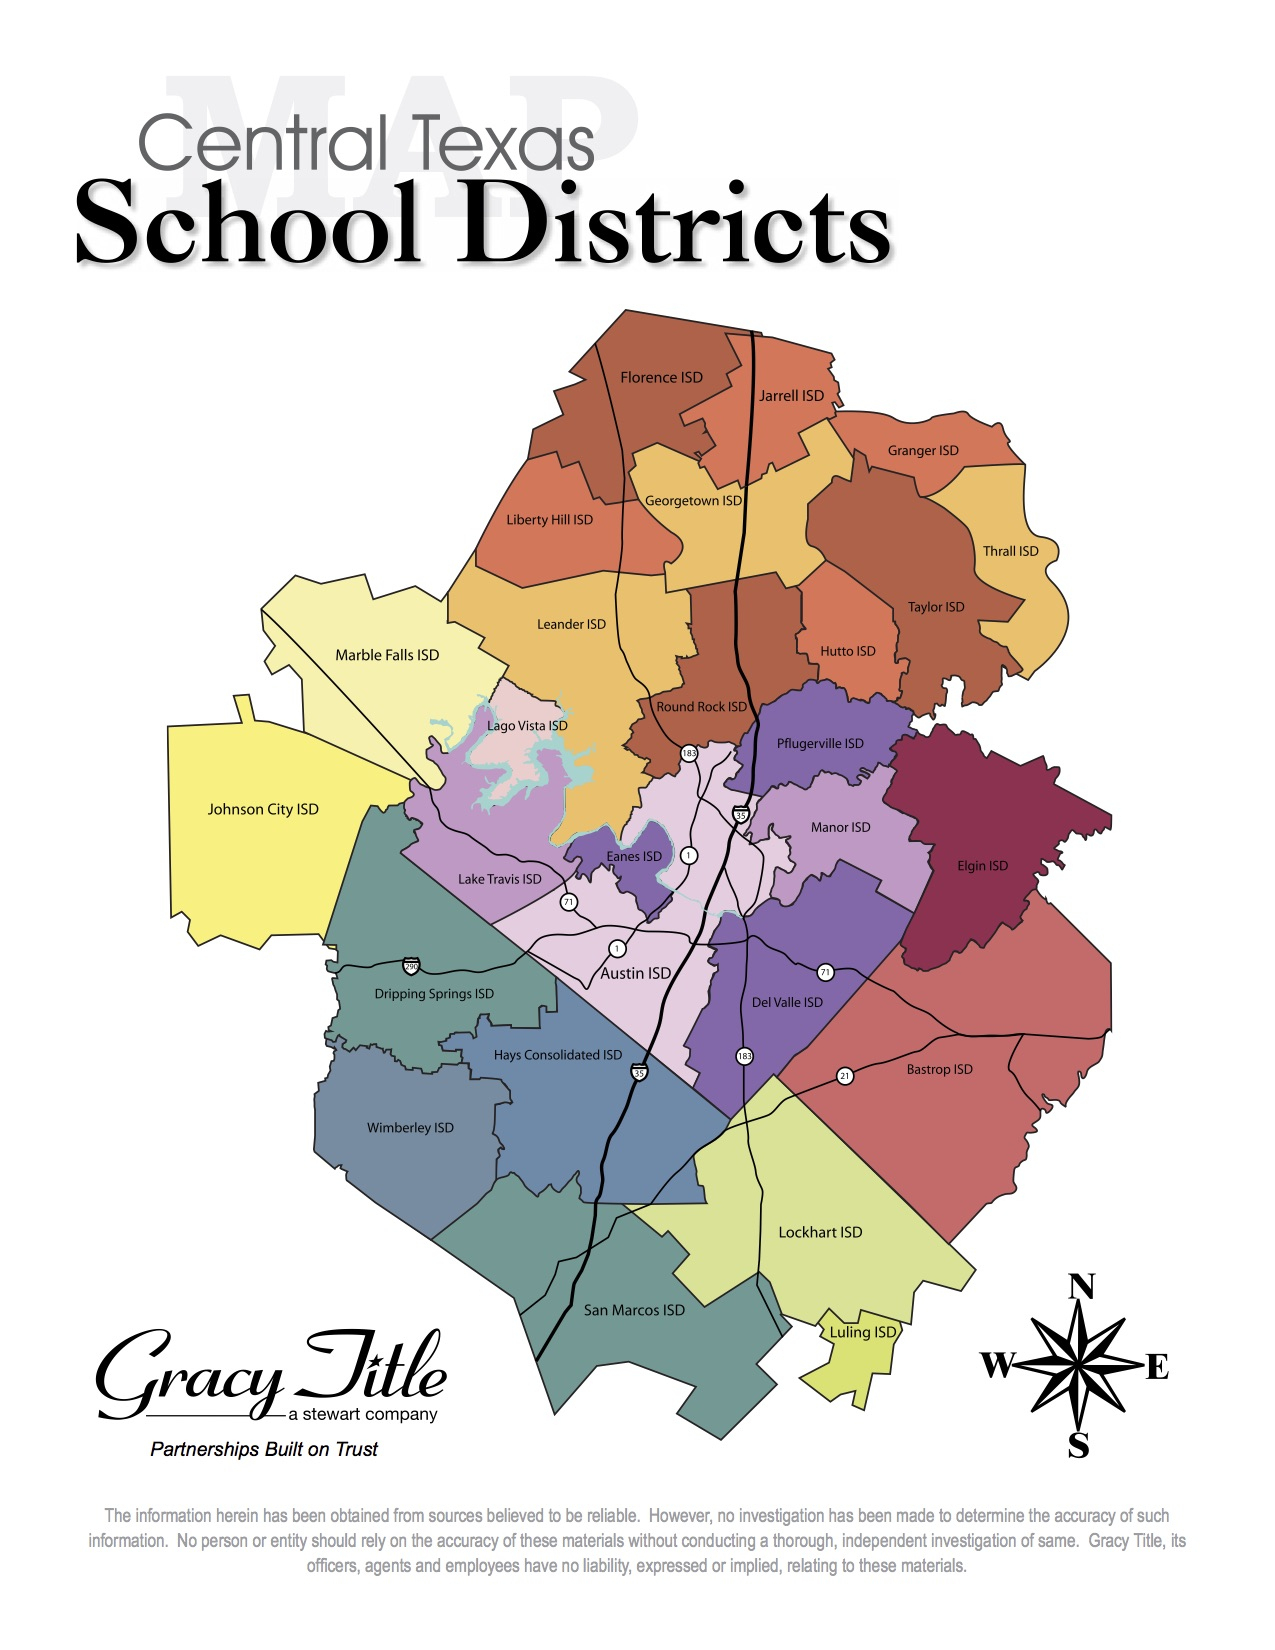 Central Texas School District Map - Cedar Park Texas Living - Texas School District Map